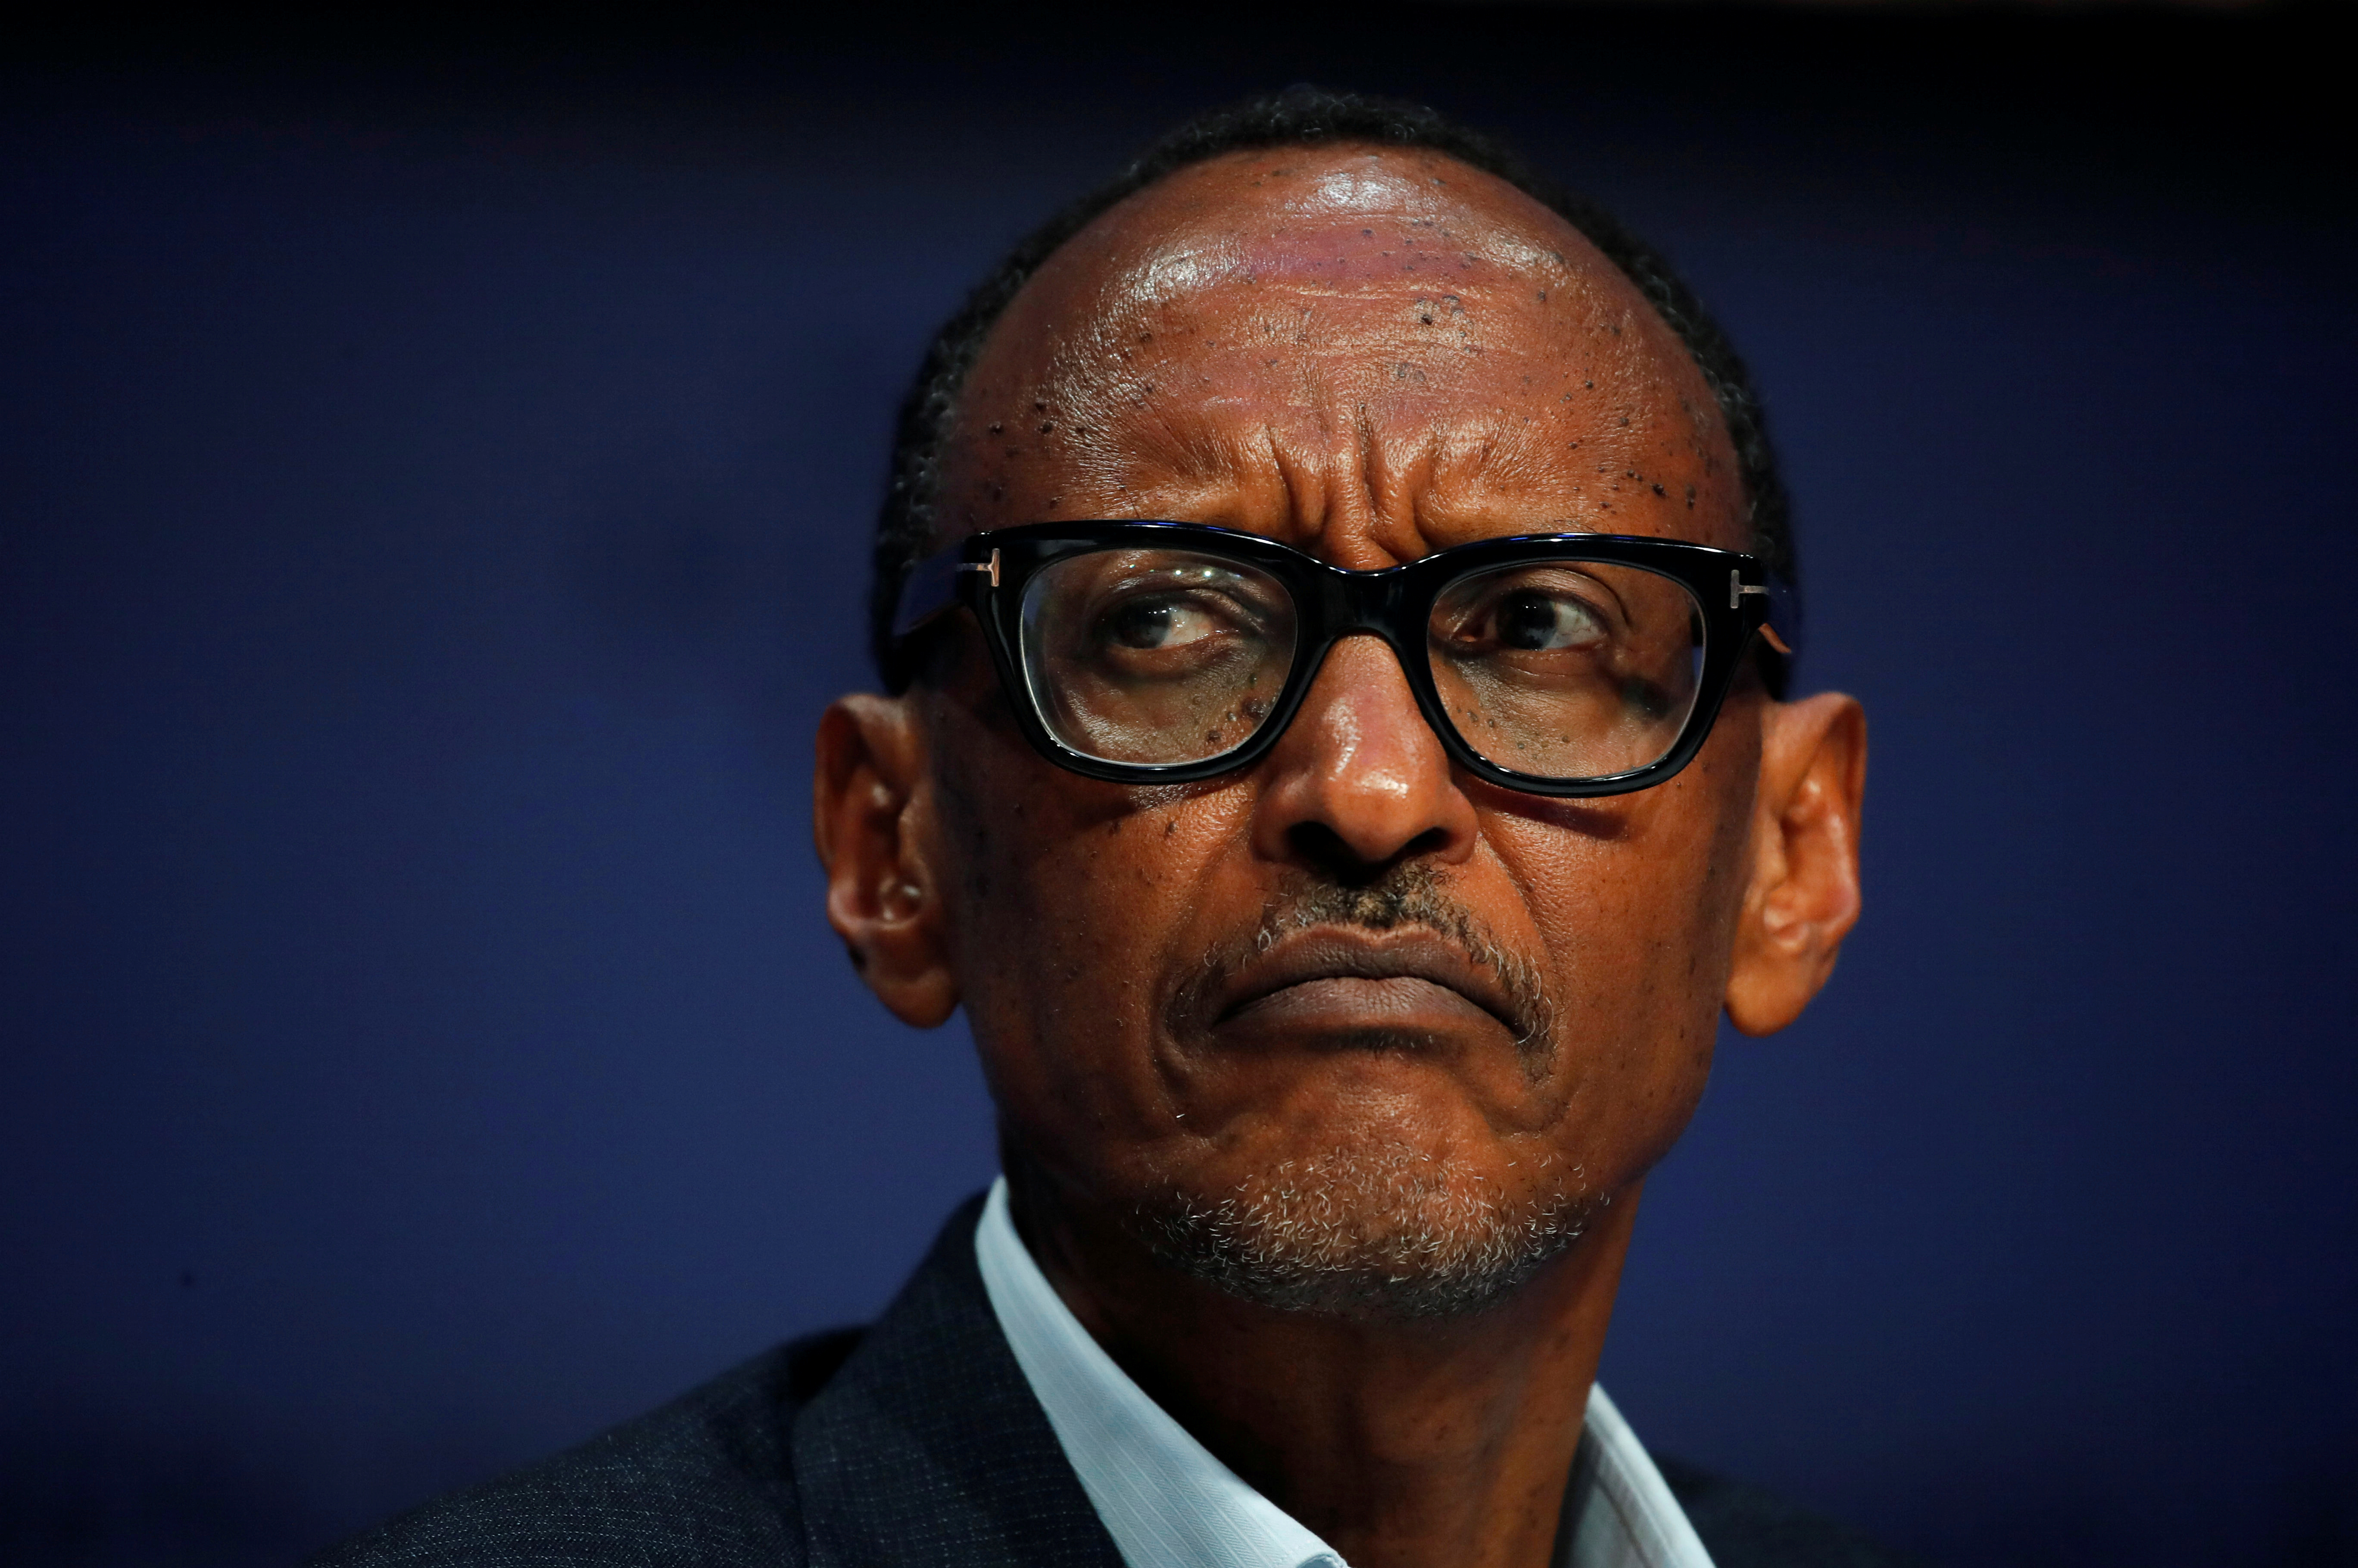 Rwanda's President Paul Kagame attends the World Economic Forum (WEF) annual meeting in Davos, Switzerland, January 23, 2019. REUTERS/Arnd Wiegmann